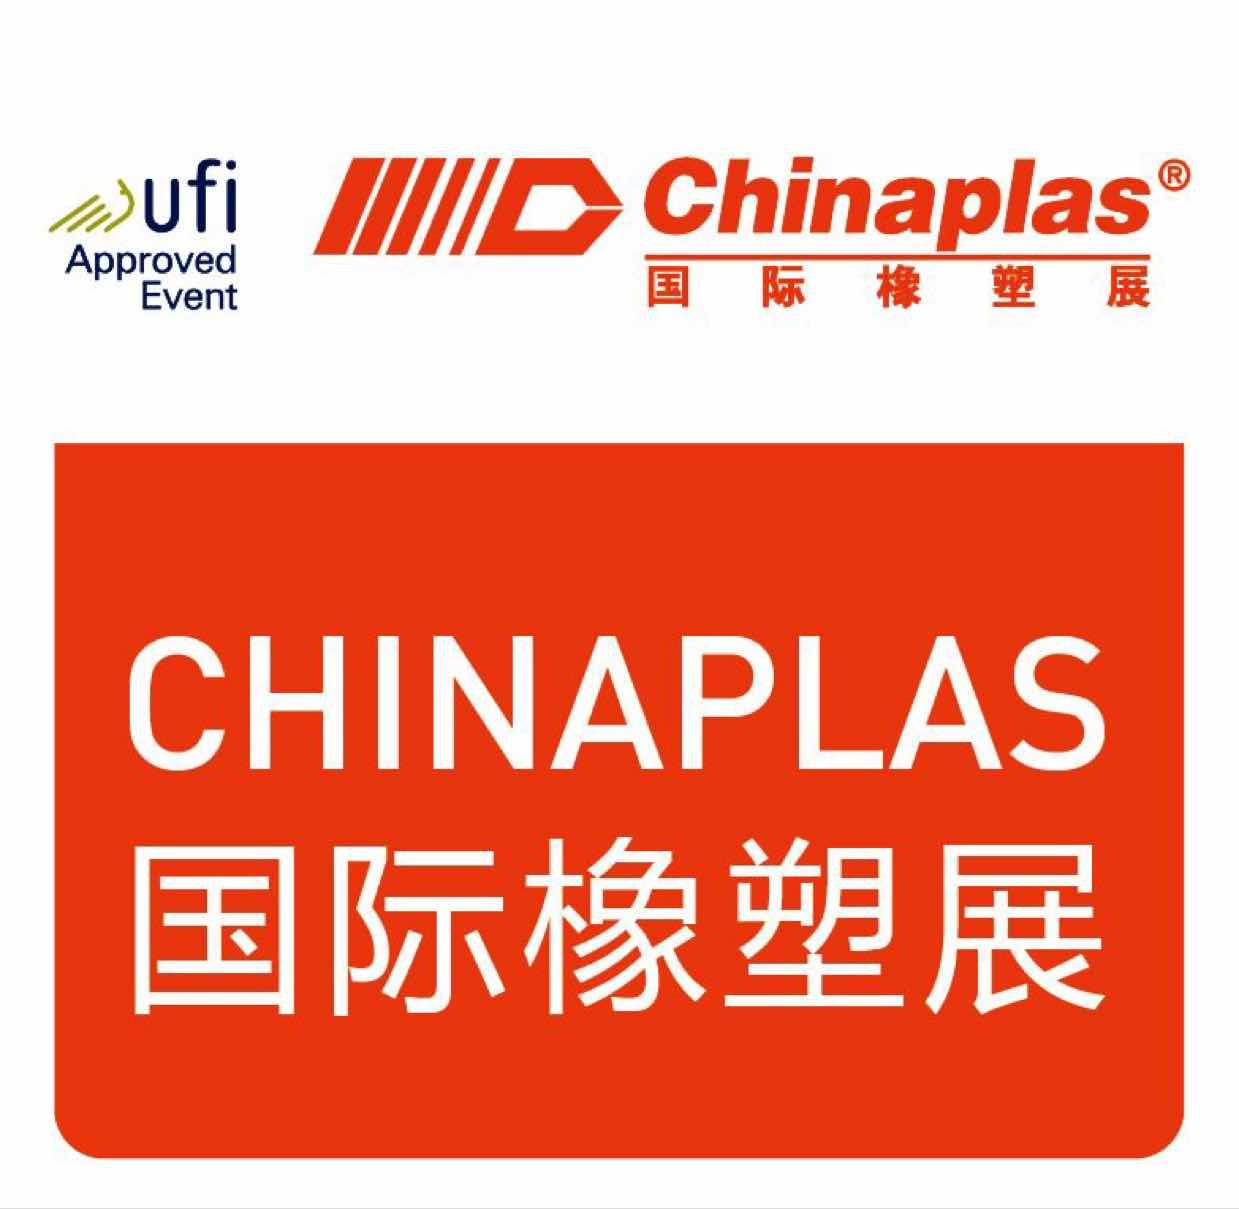 CHINAPLAS 2021 国际橡塑展今天盛大开幕